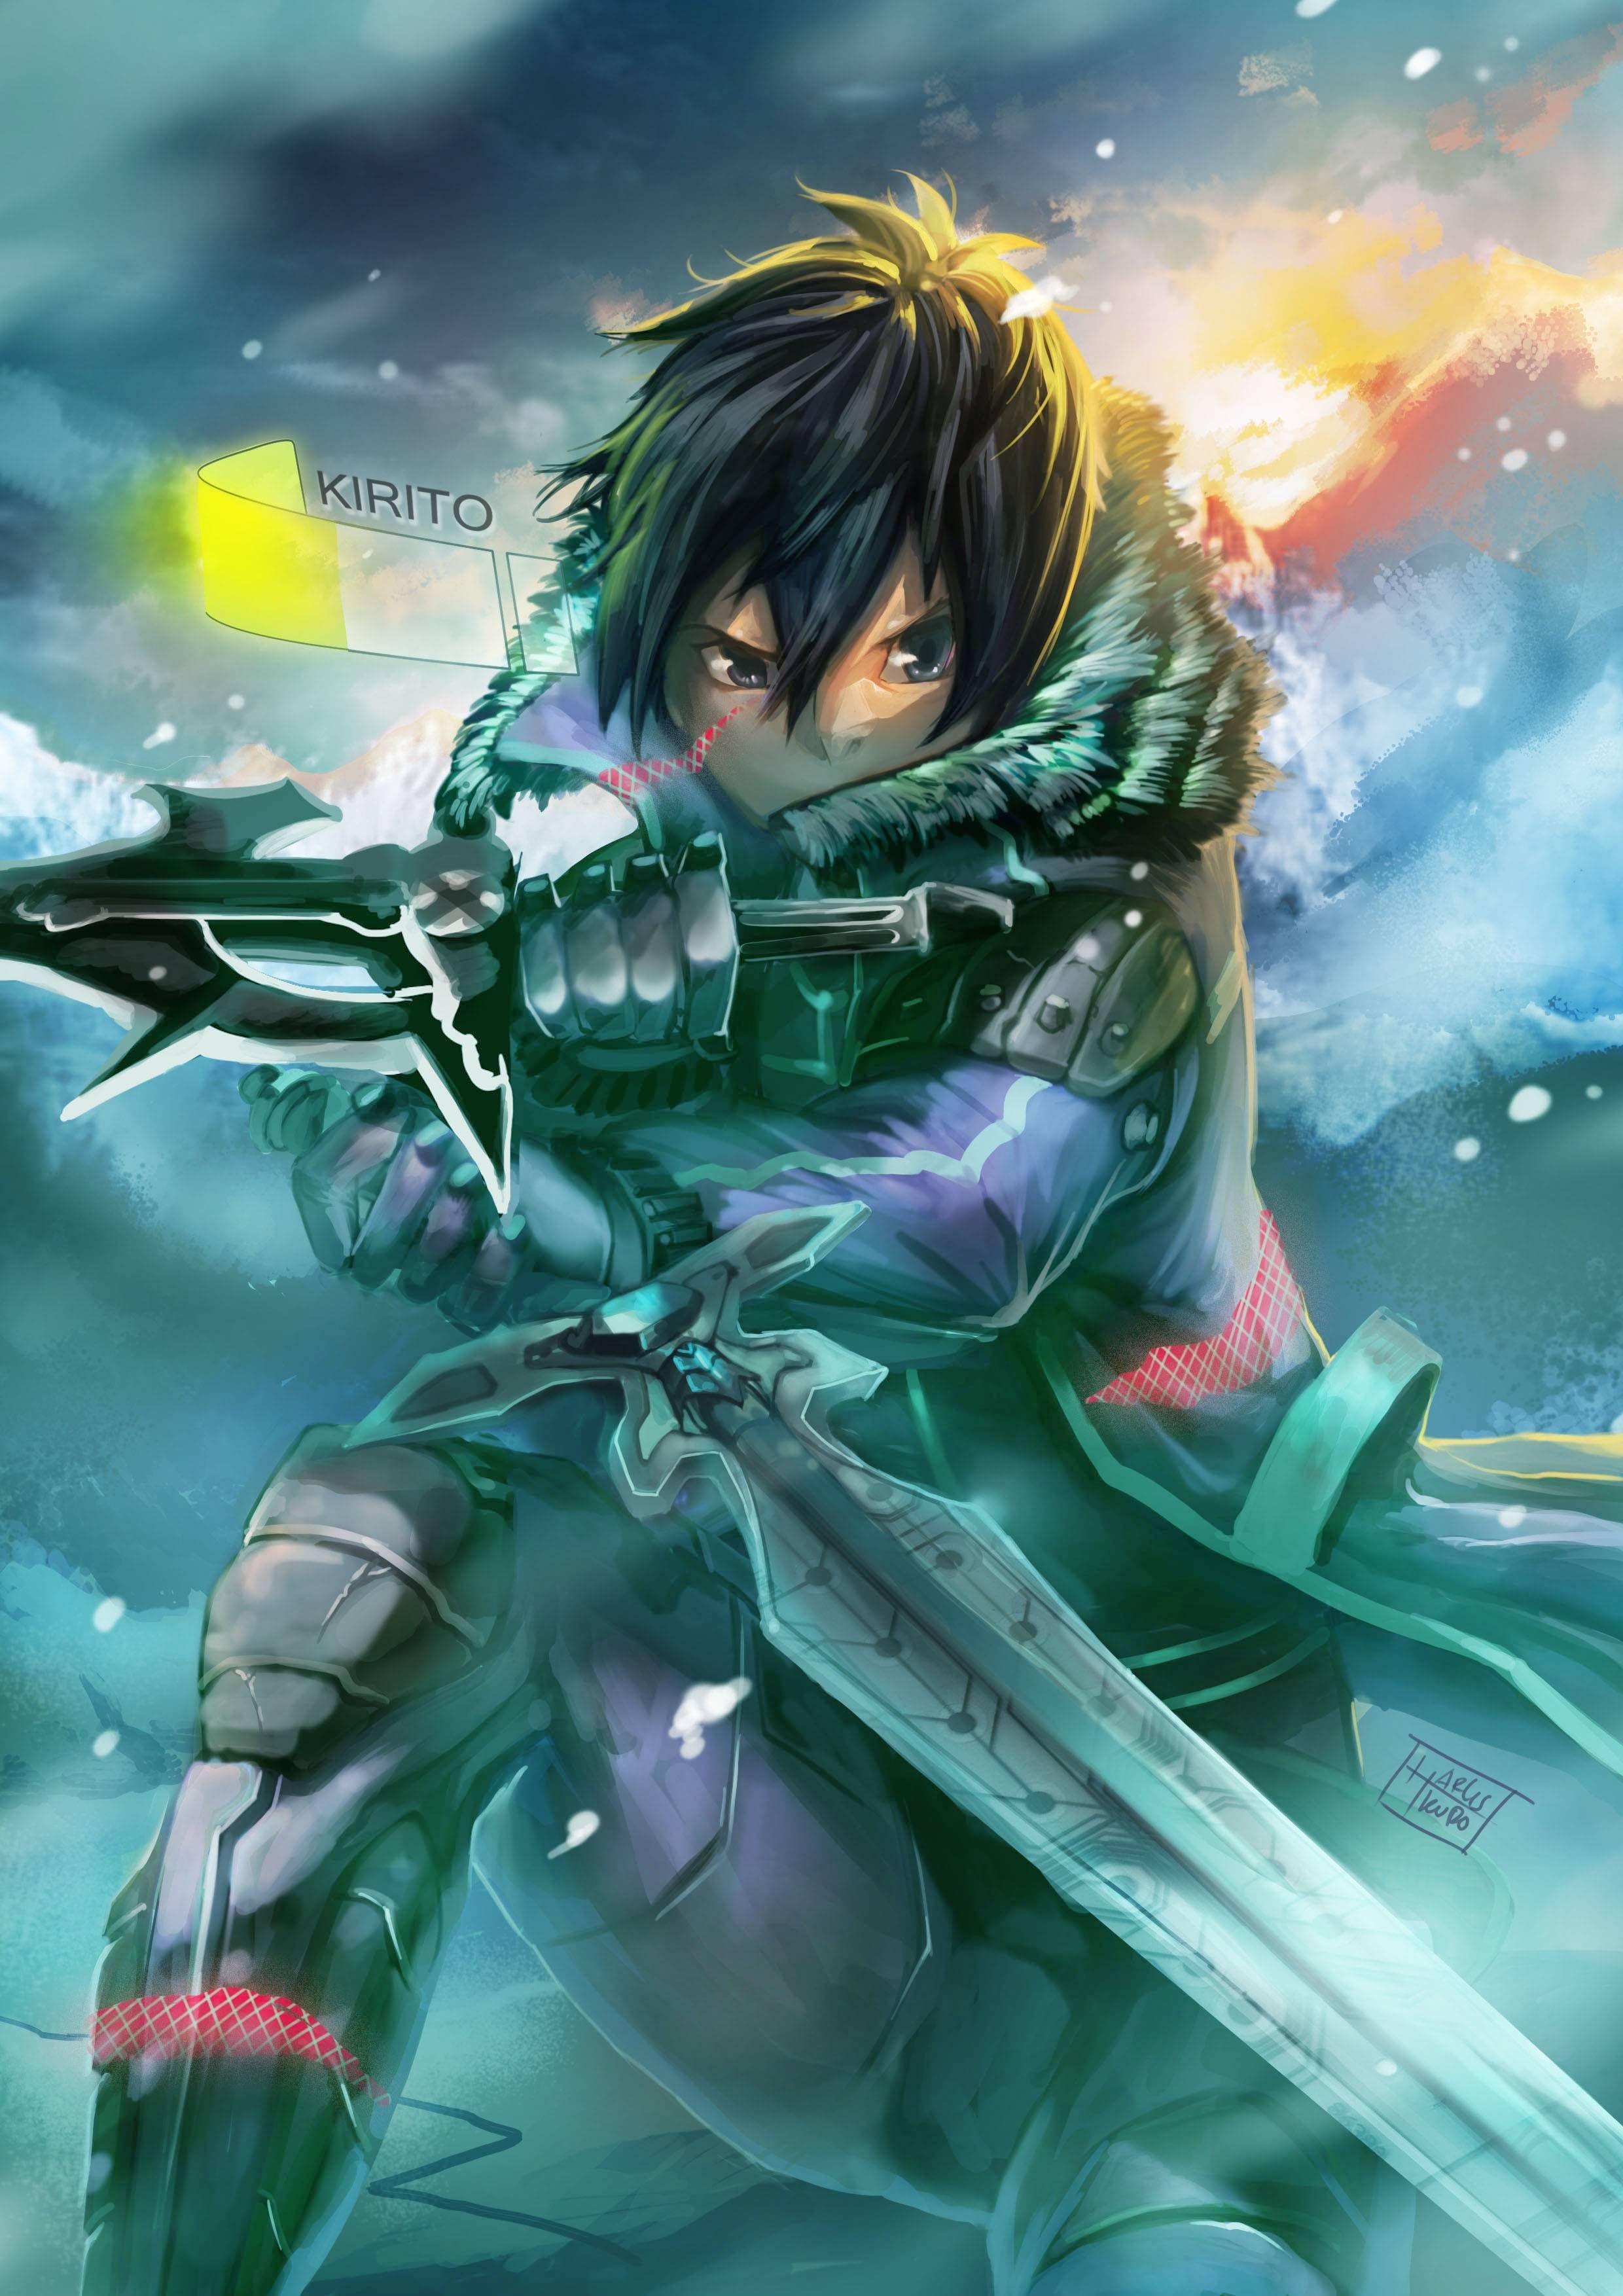 Imgur Post Imgur Sword Art Online Wallpaper Sword Art Online Kirito Sword Art Epic anime fanart wallpaper